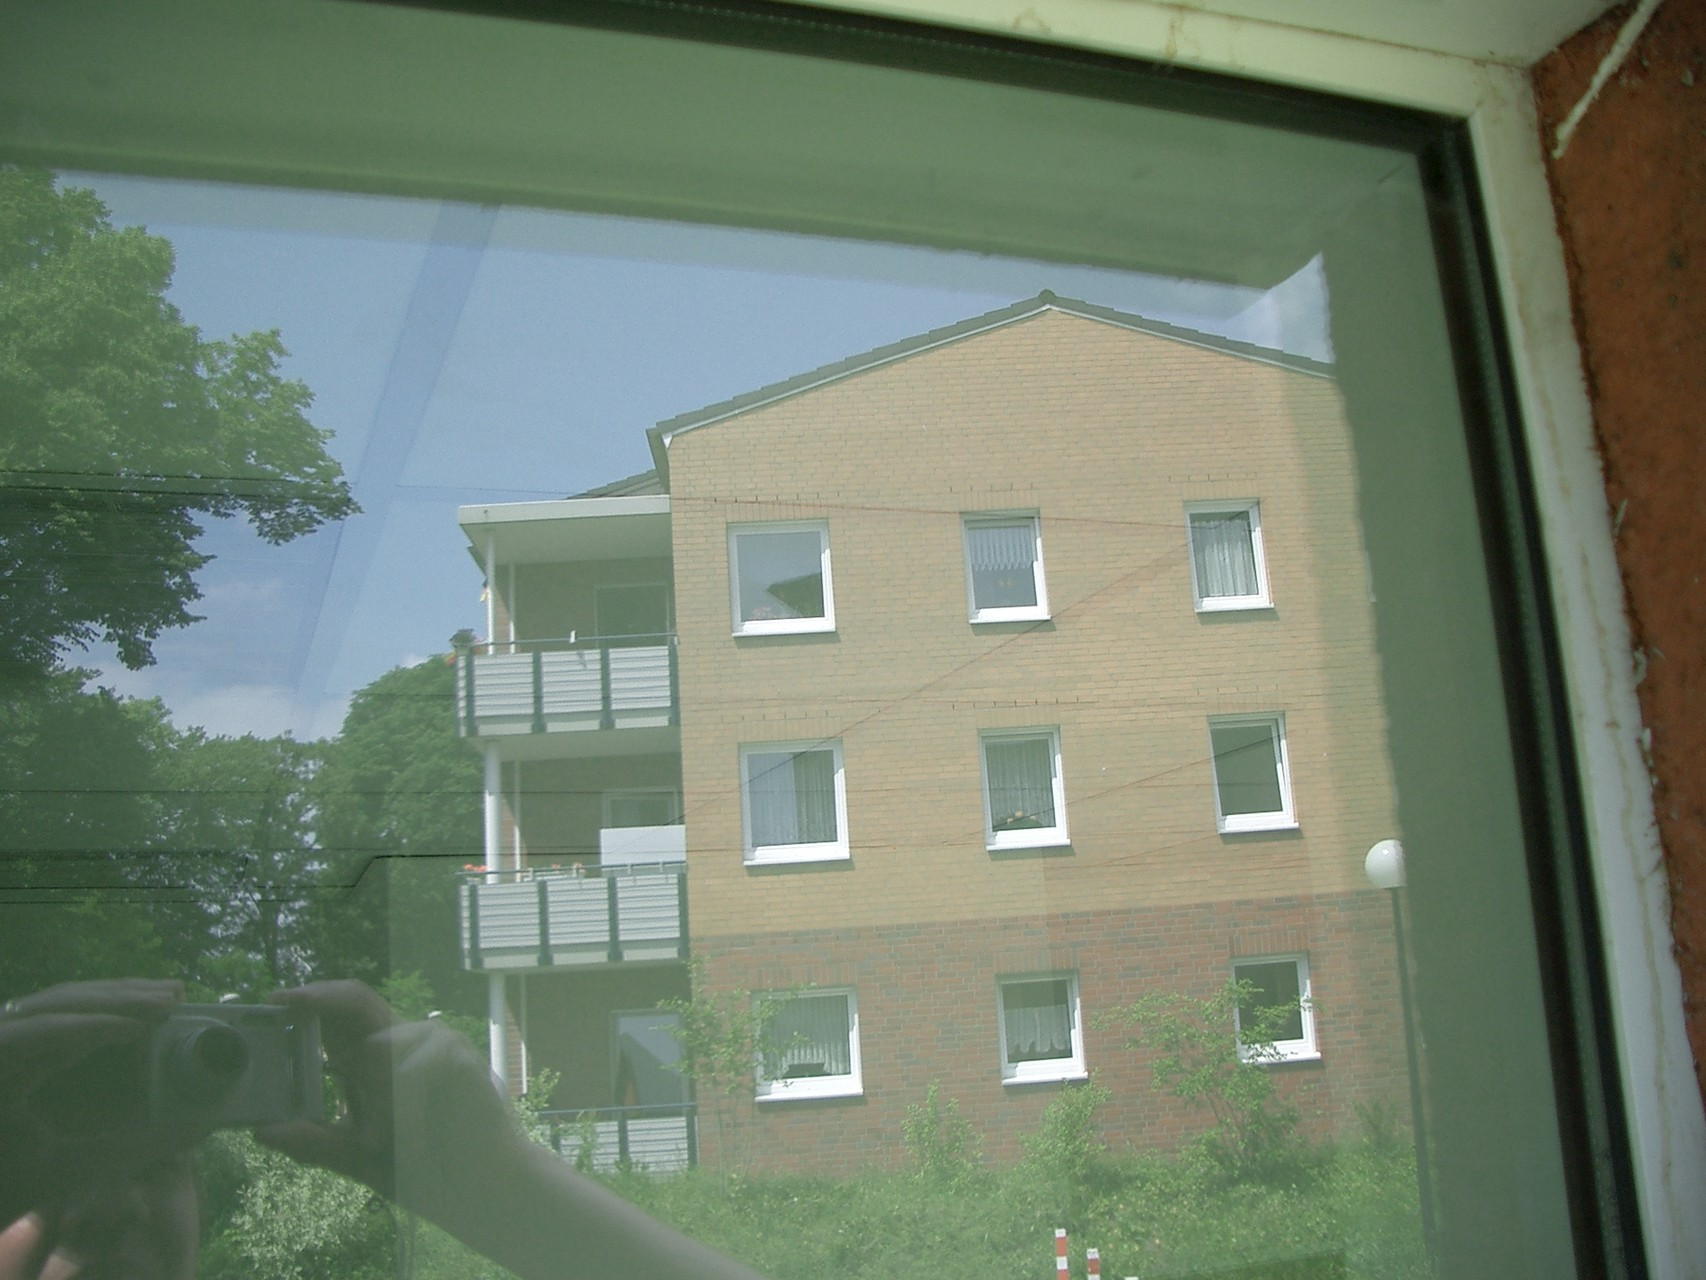 GLASRENOVATION - Glasverätzungen durch Betonauswaschung - nachher